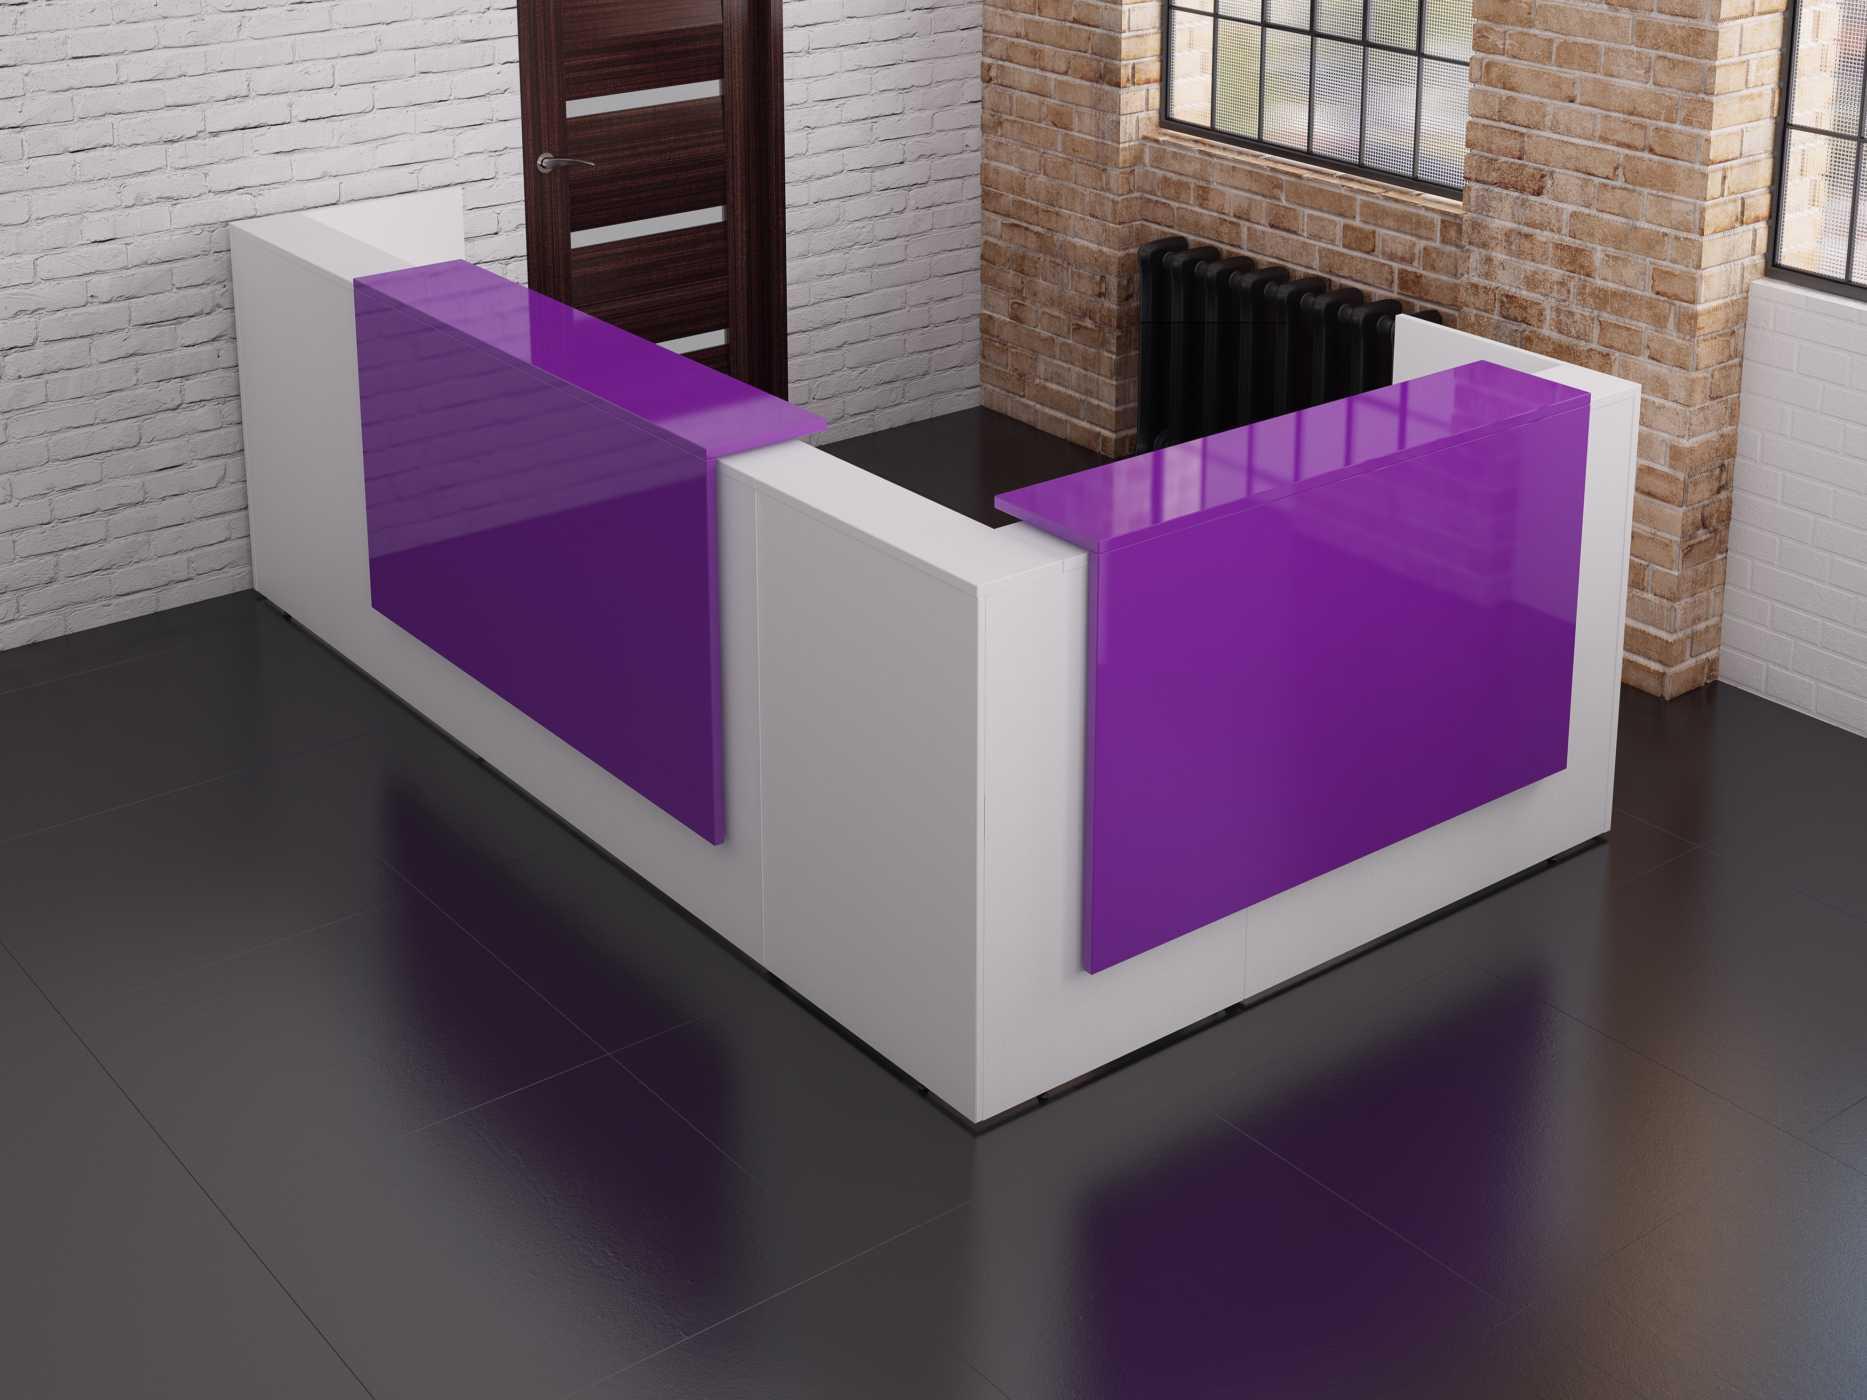 Tcs Zion Corner Reception Desk Rapid Office Furniture